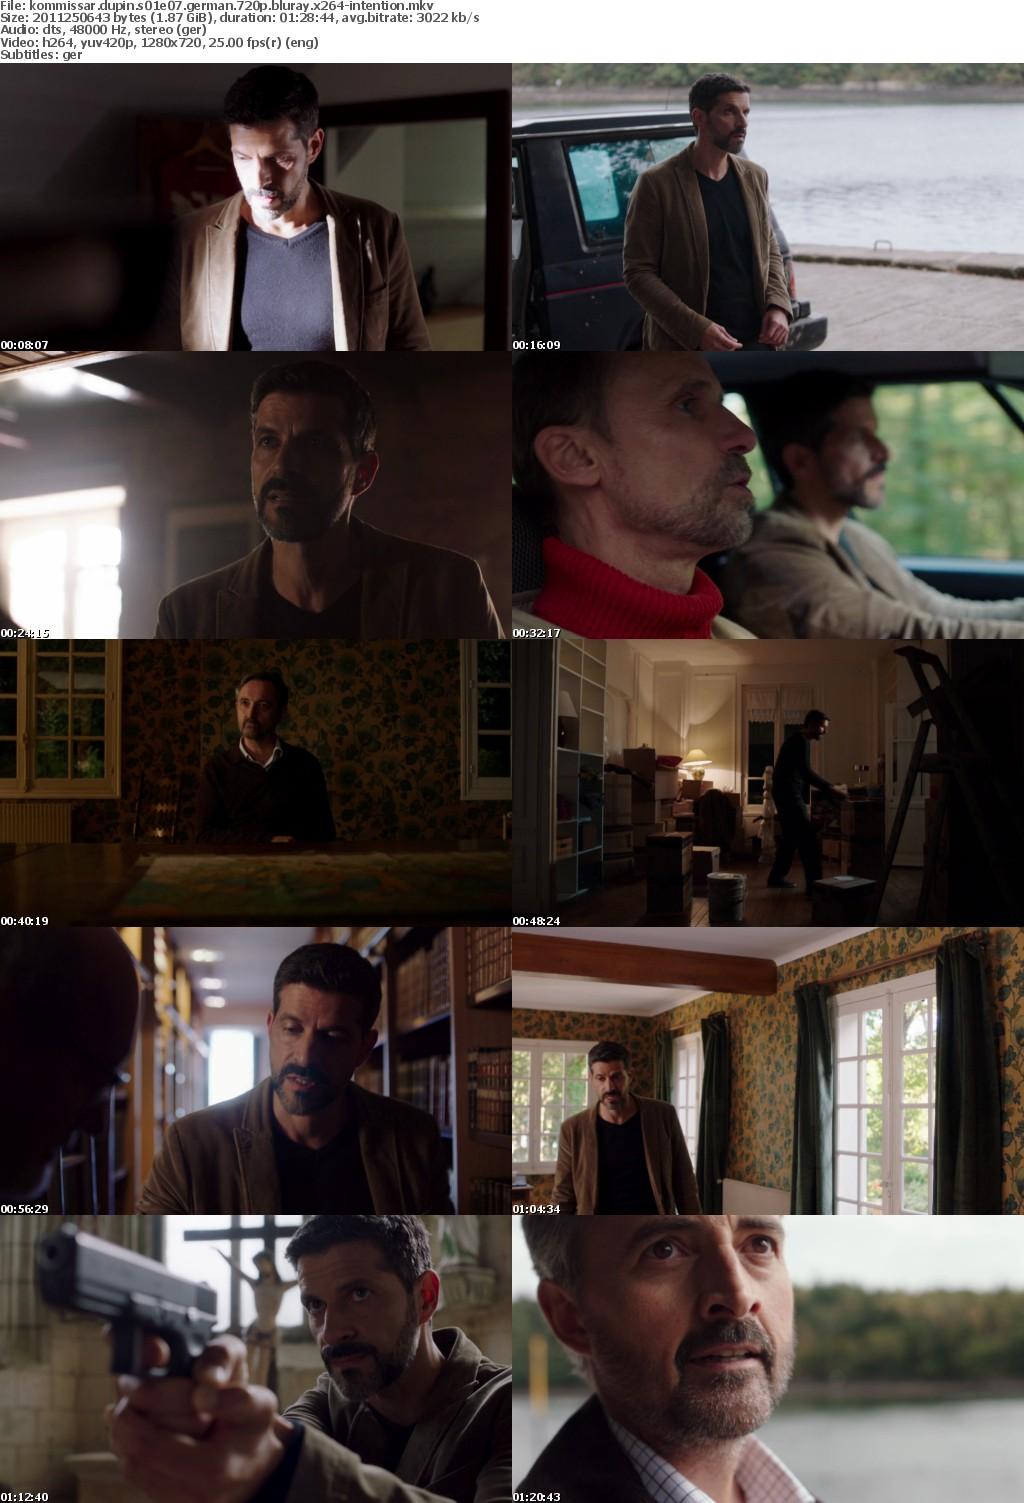 Kommissar Dupin S01E07 German 720p BluRay x264-iNTENTiON